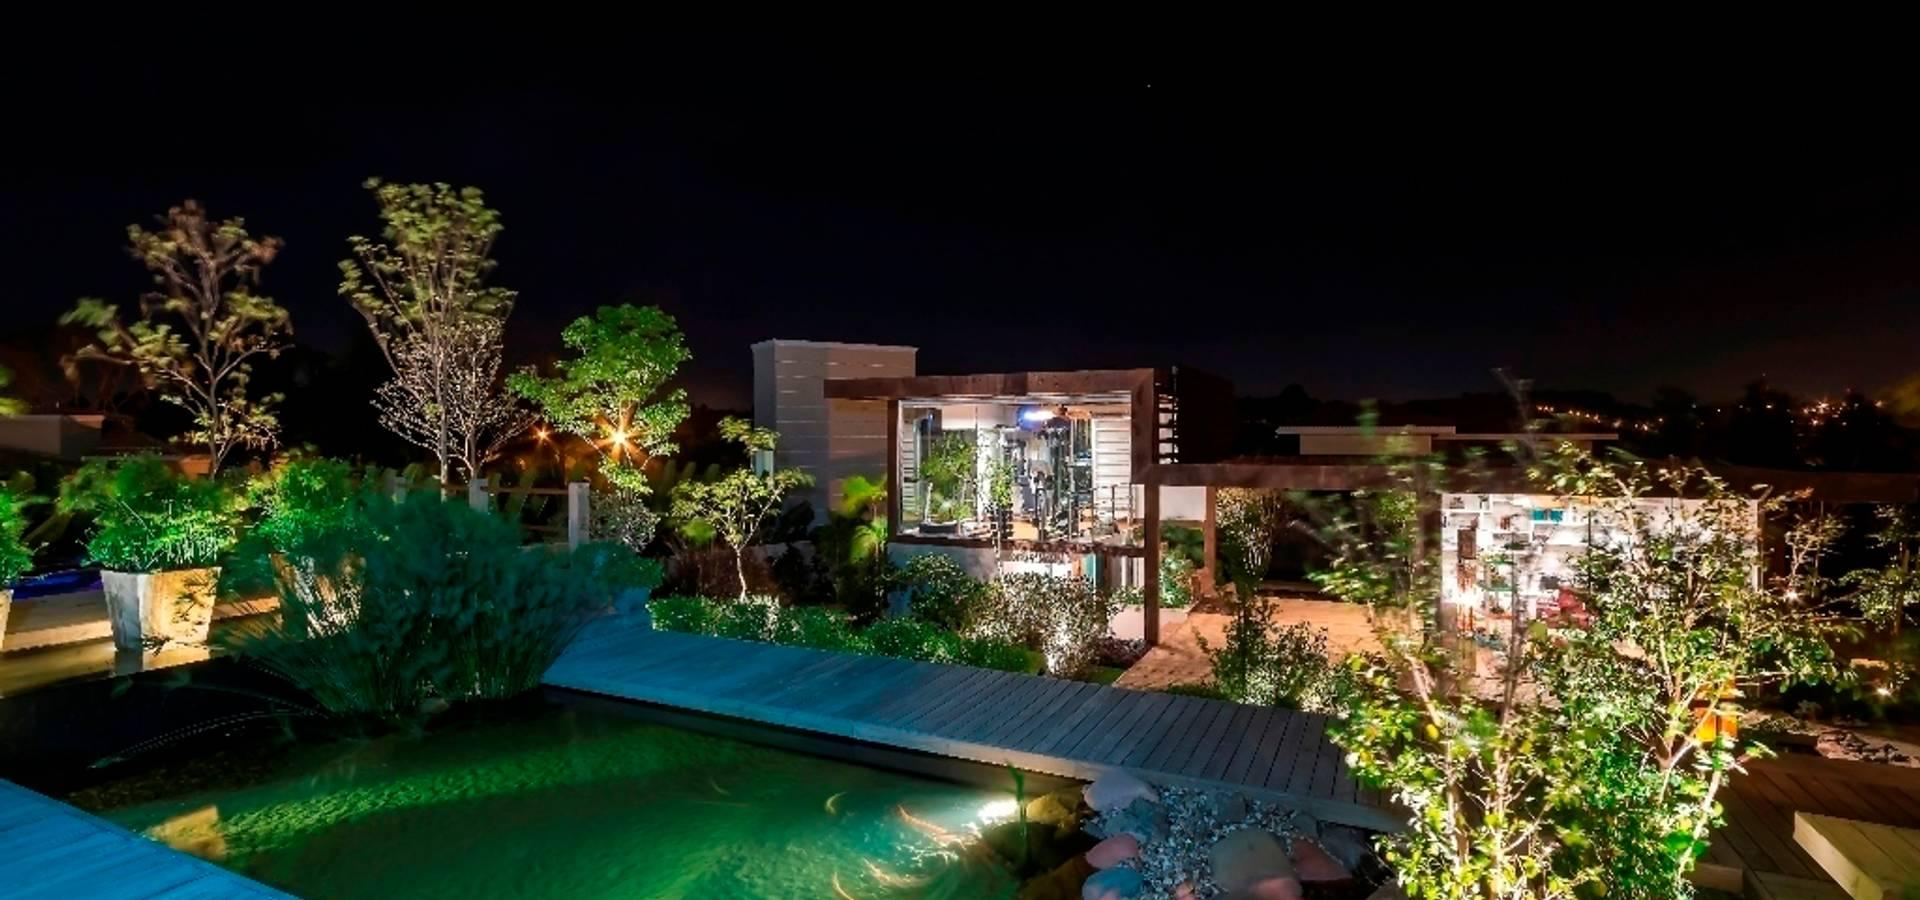 Jannini & Sagarra Arquitetura